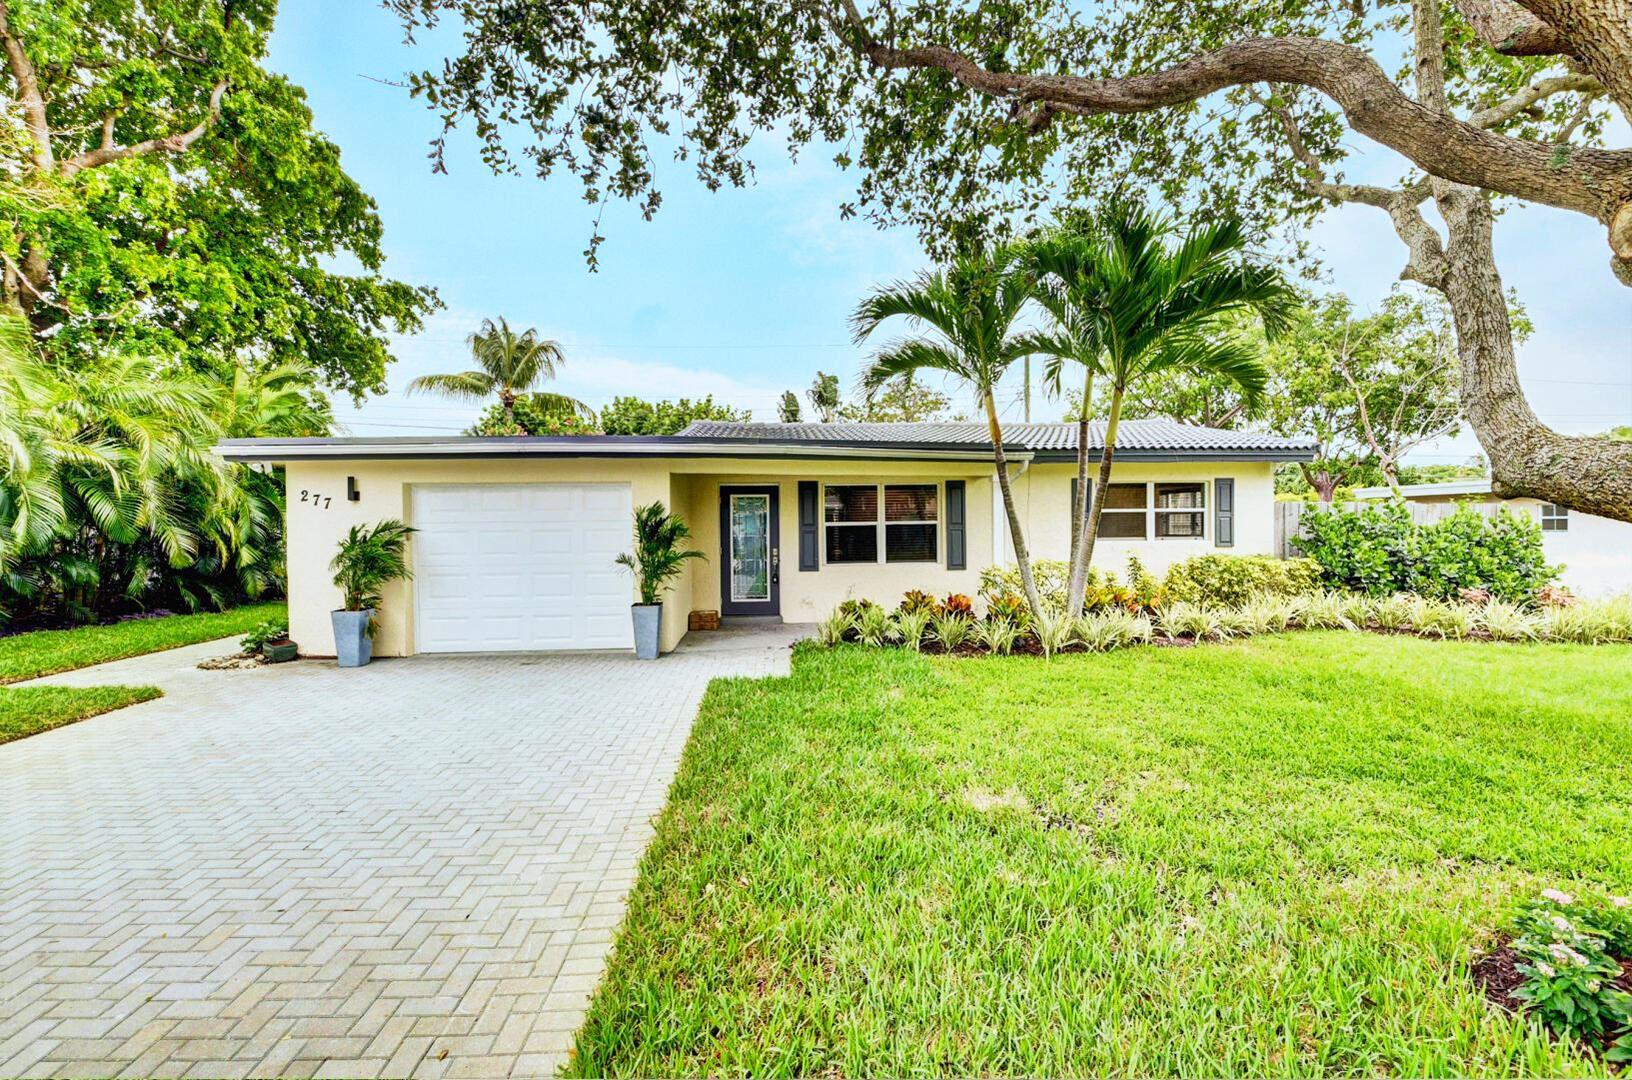 277 NW 7th Street, Boca Raton, FL 33432 - MLS#: RX-10745530